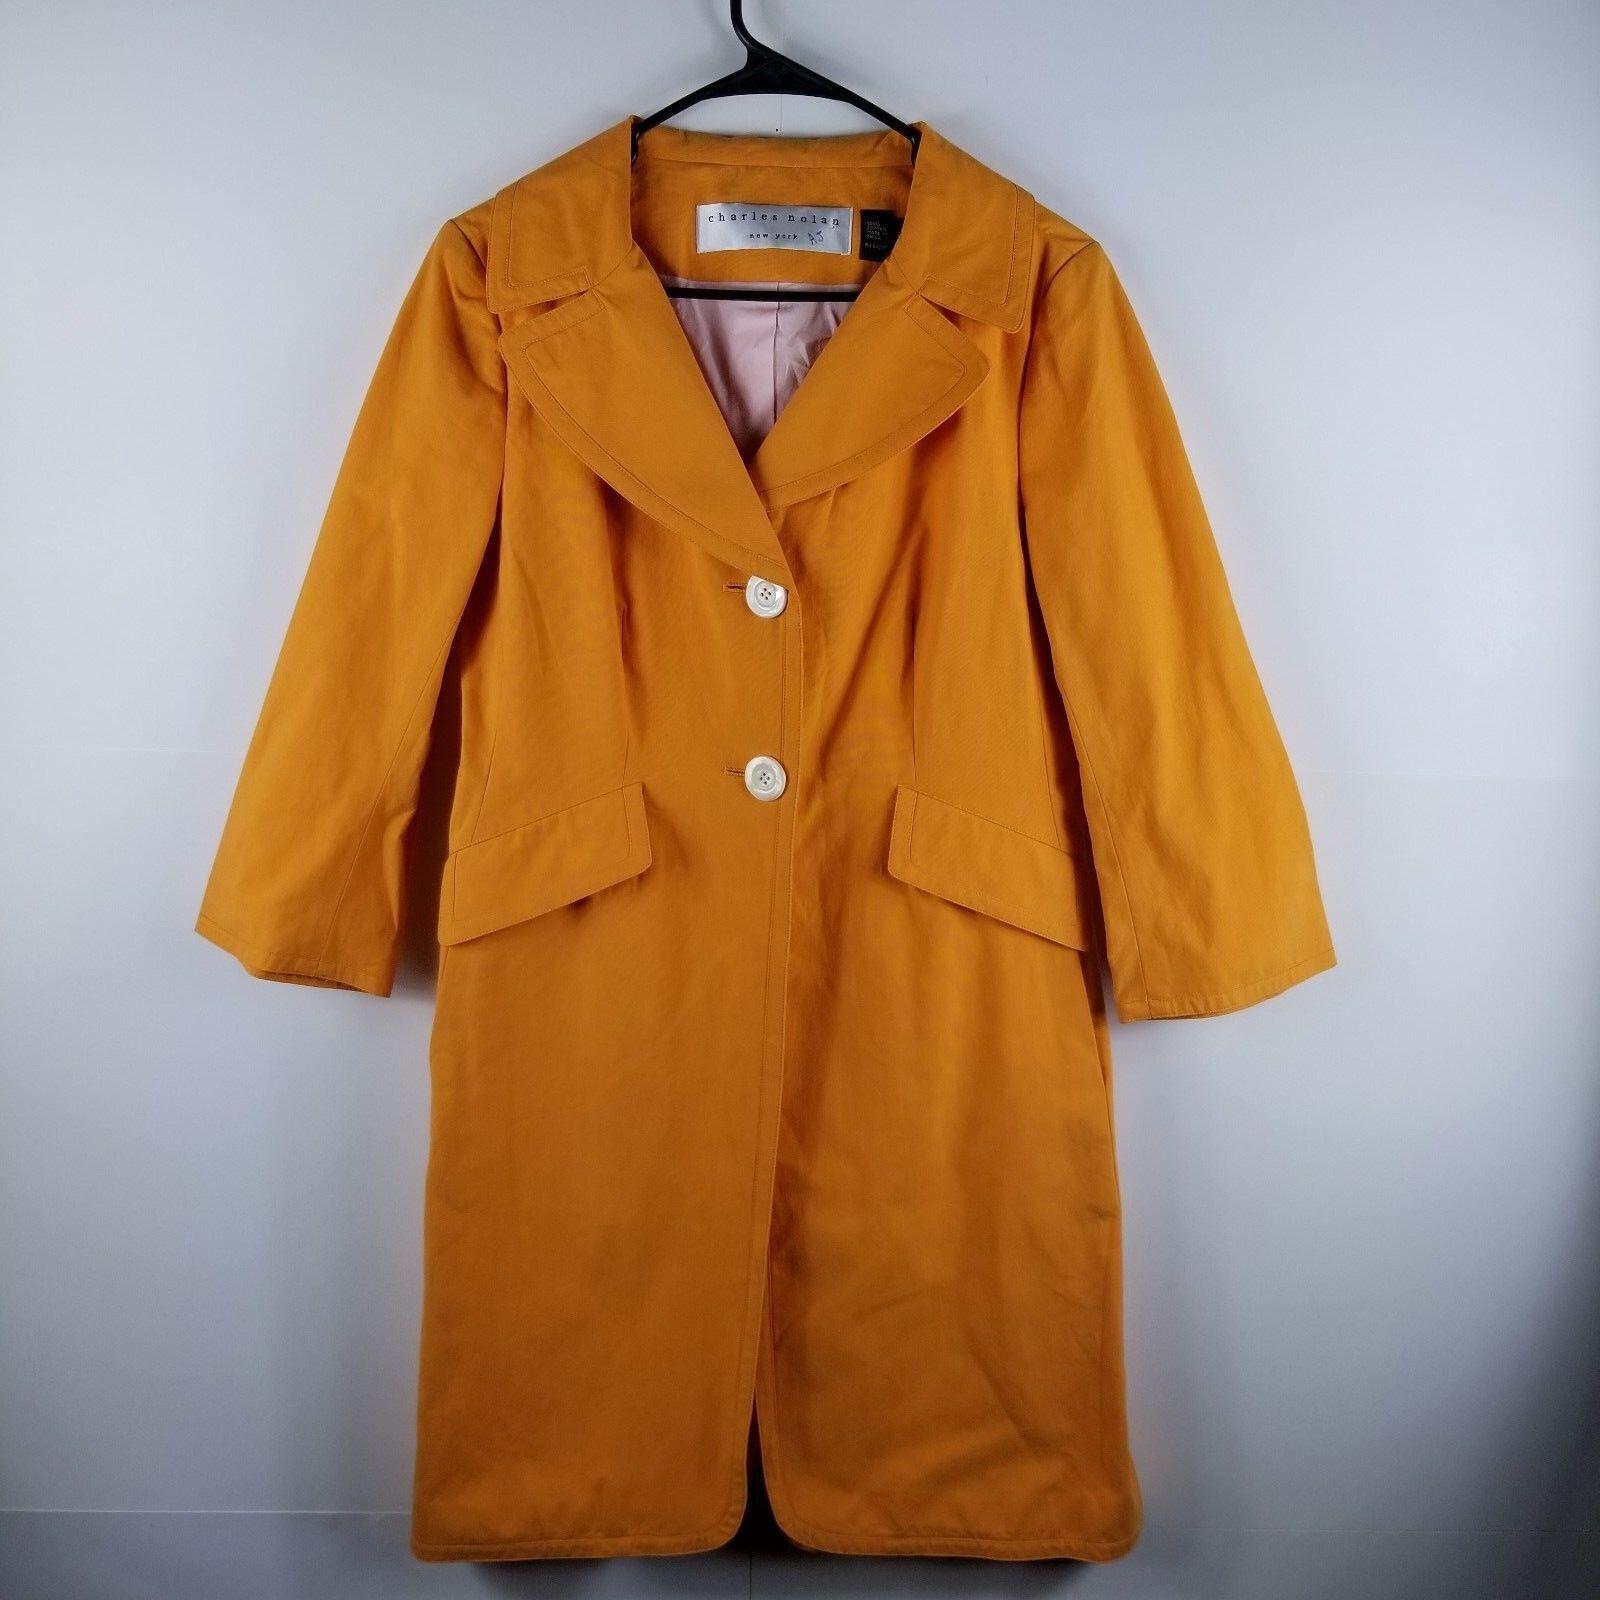 Charles Nolan Women Trench Coat Button Down Lined  Cotton orange 8